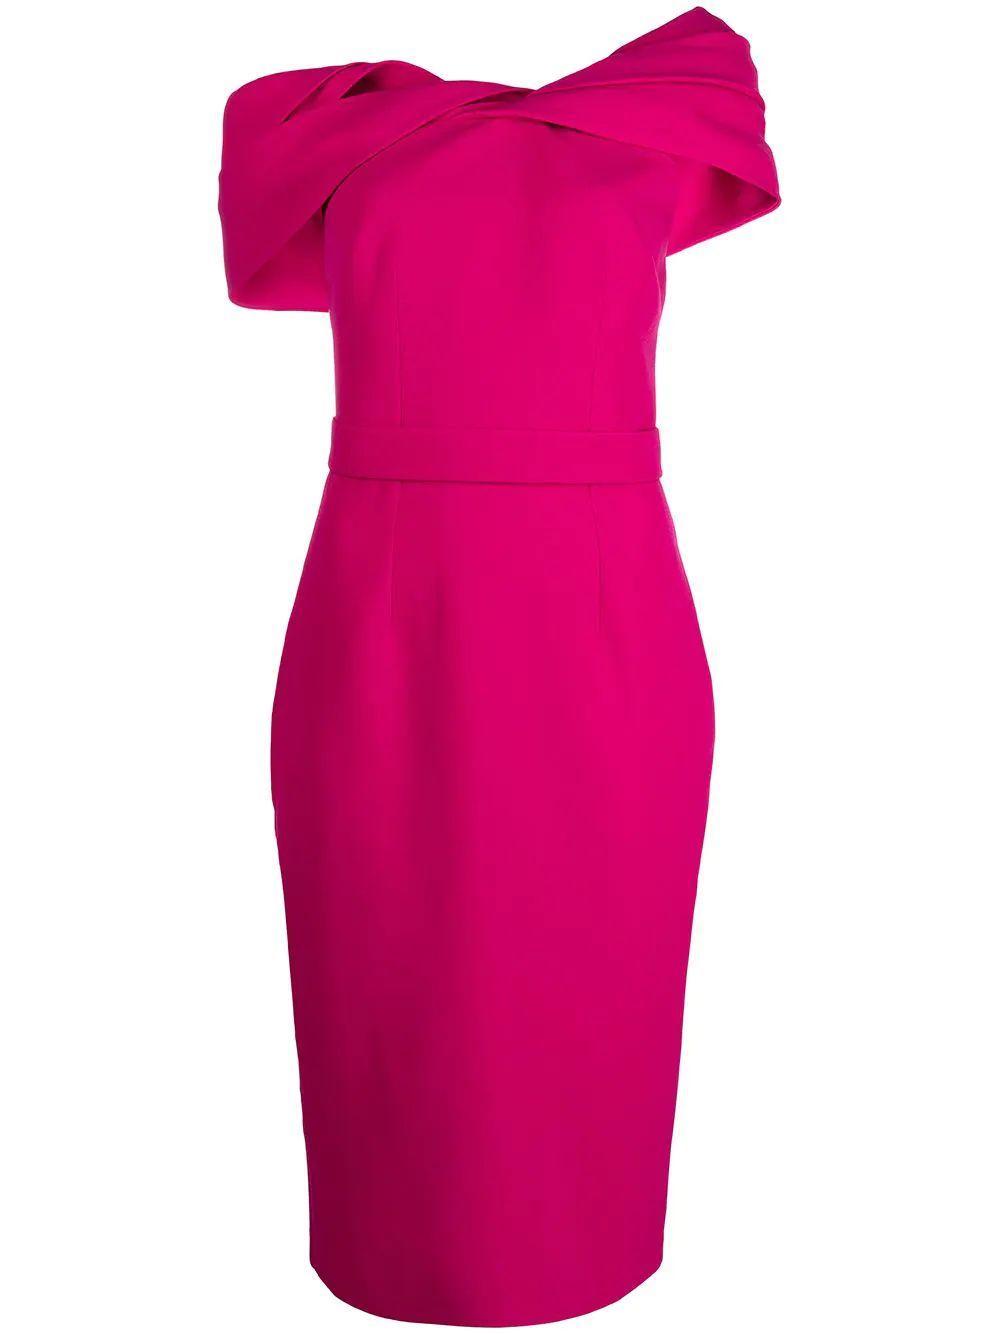 Draped Shoulder Dress Item # D341-1